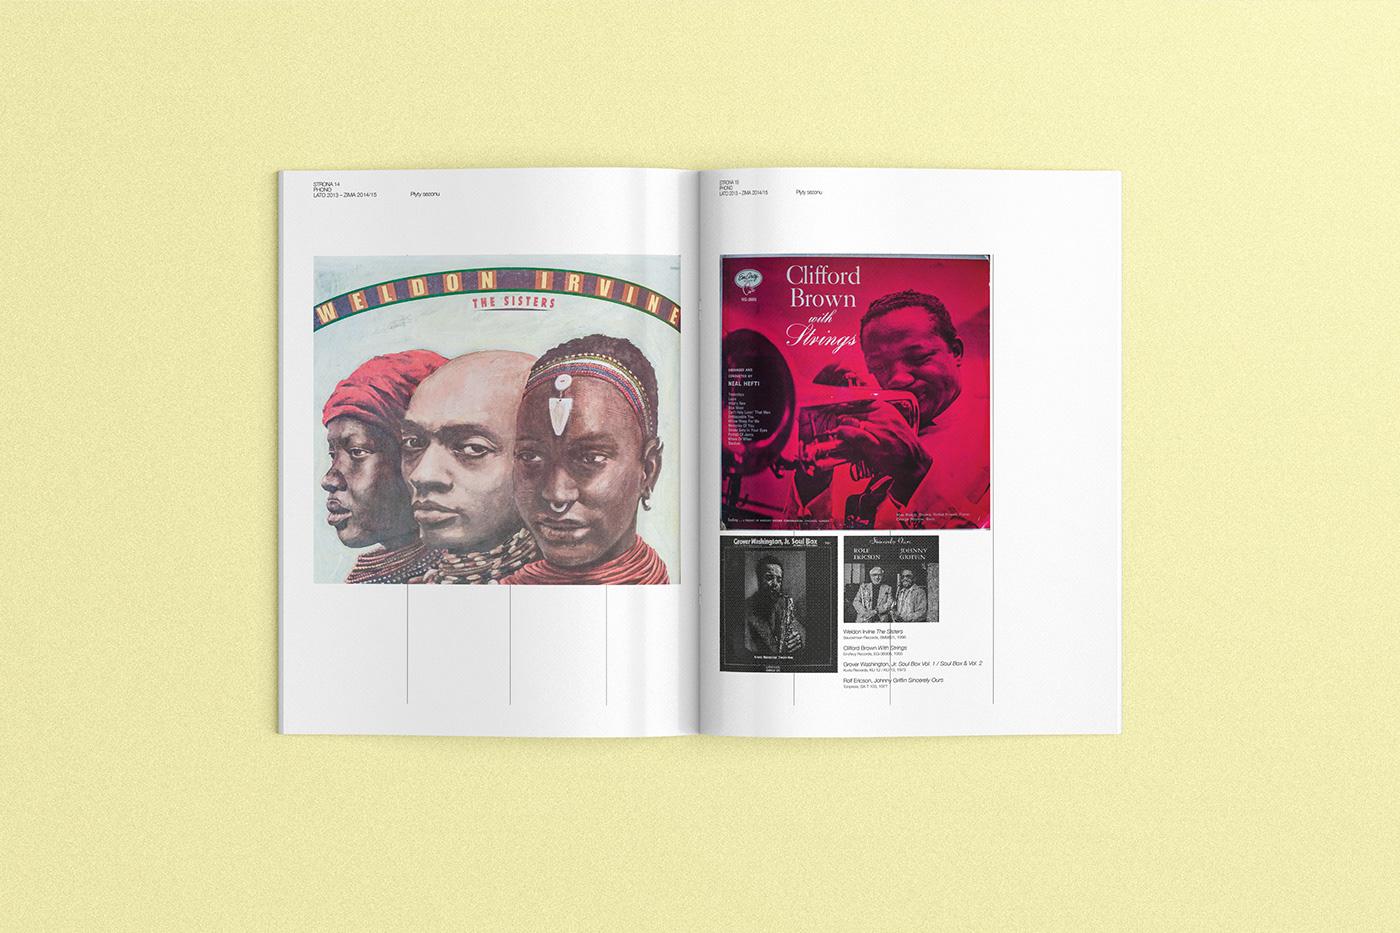 Image may contain: book, drawing and human face